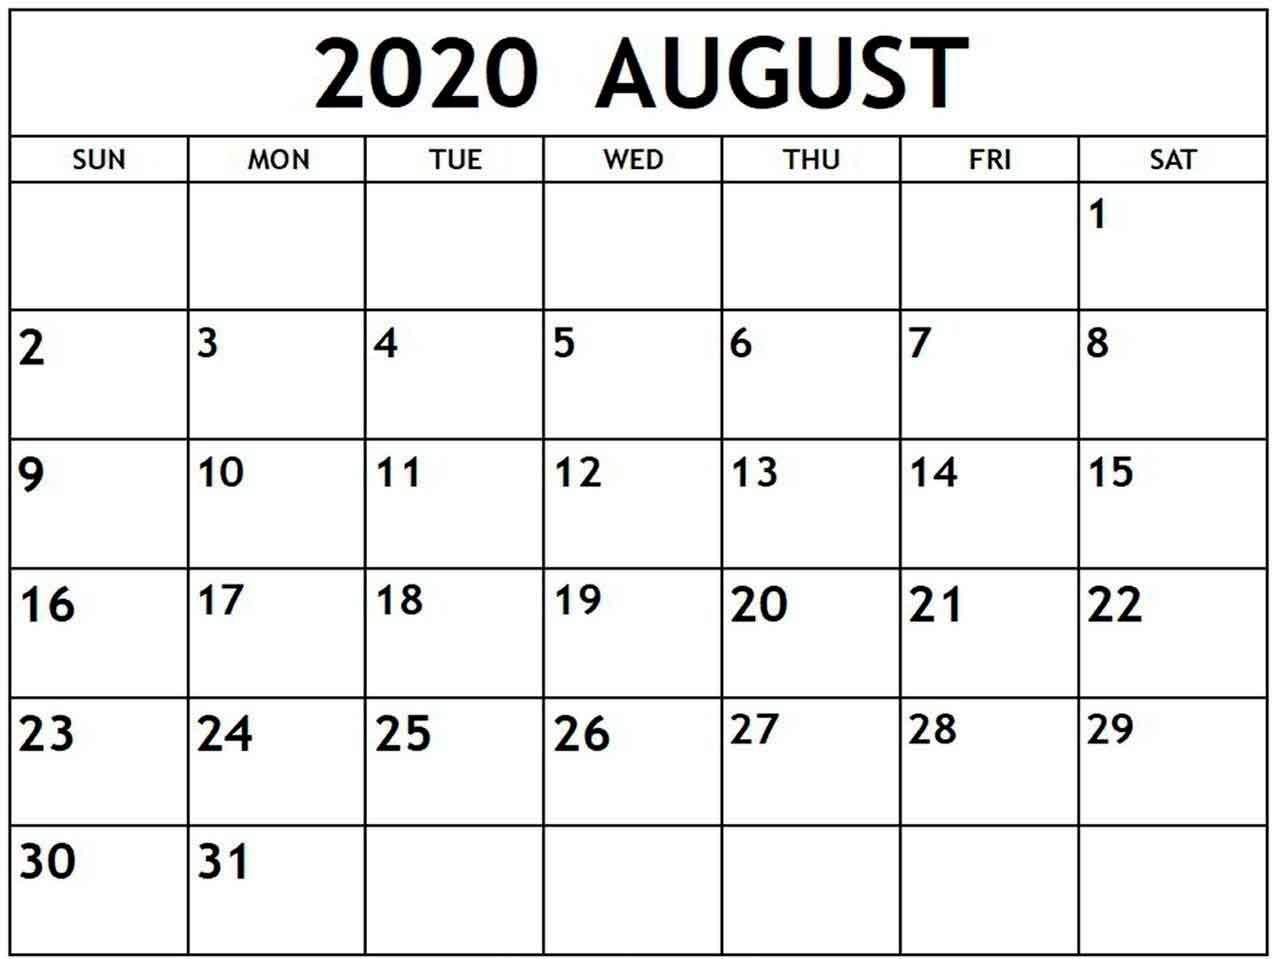 Editable August 2020 Calendar - Free Printable Calendar regarding Free Editable 2020 Calendars